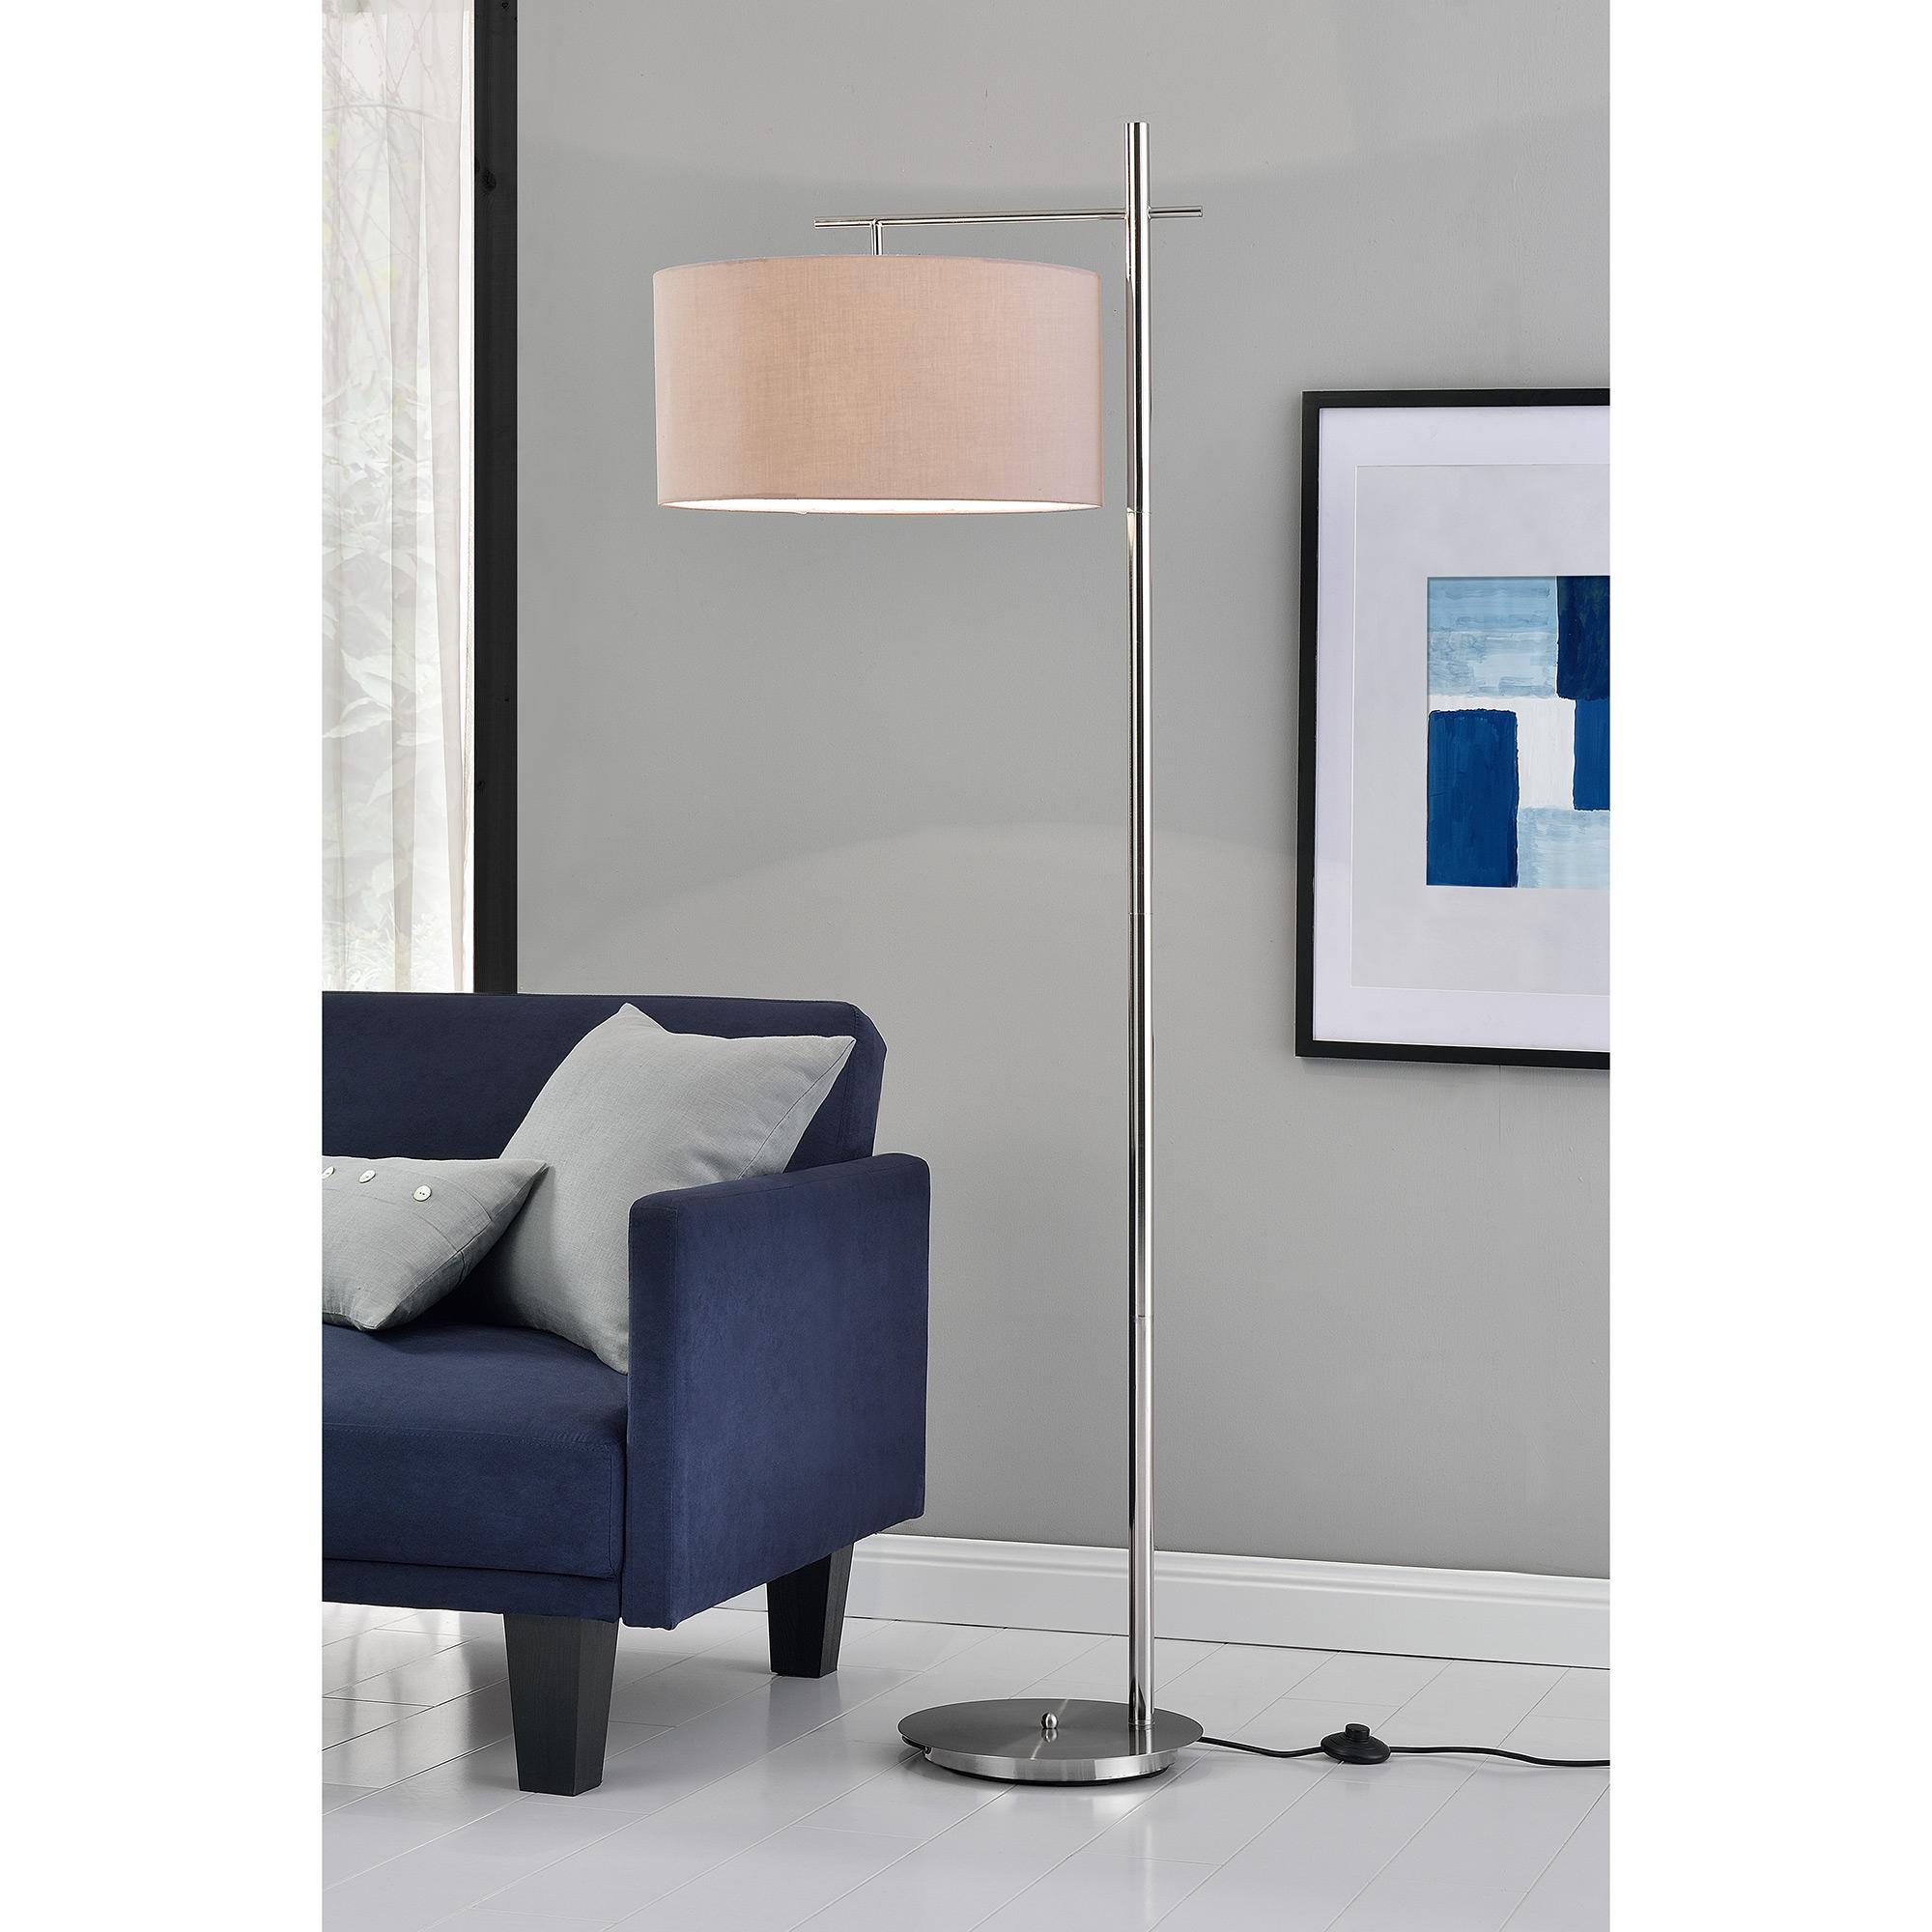 Piantana piantana design lampada luce piantana for Modello di layout del pavimento